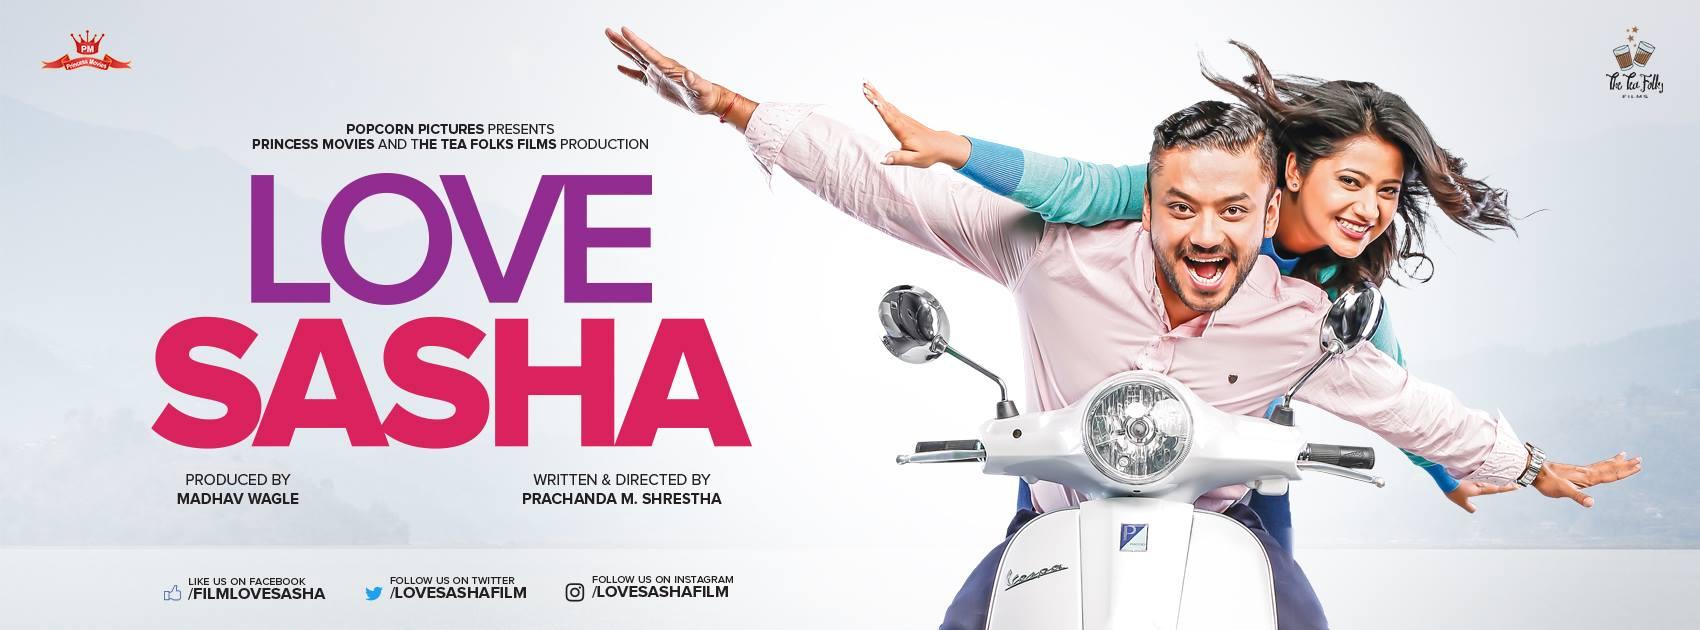 Love Sasha Movie Poster